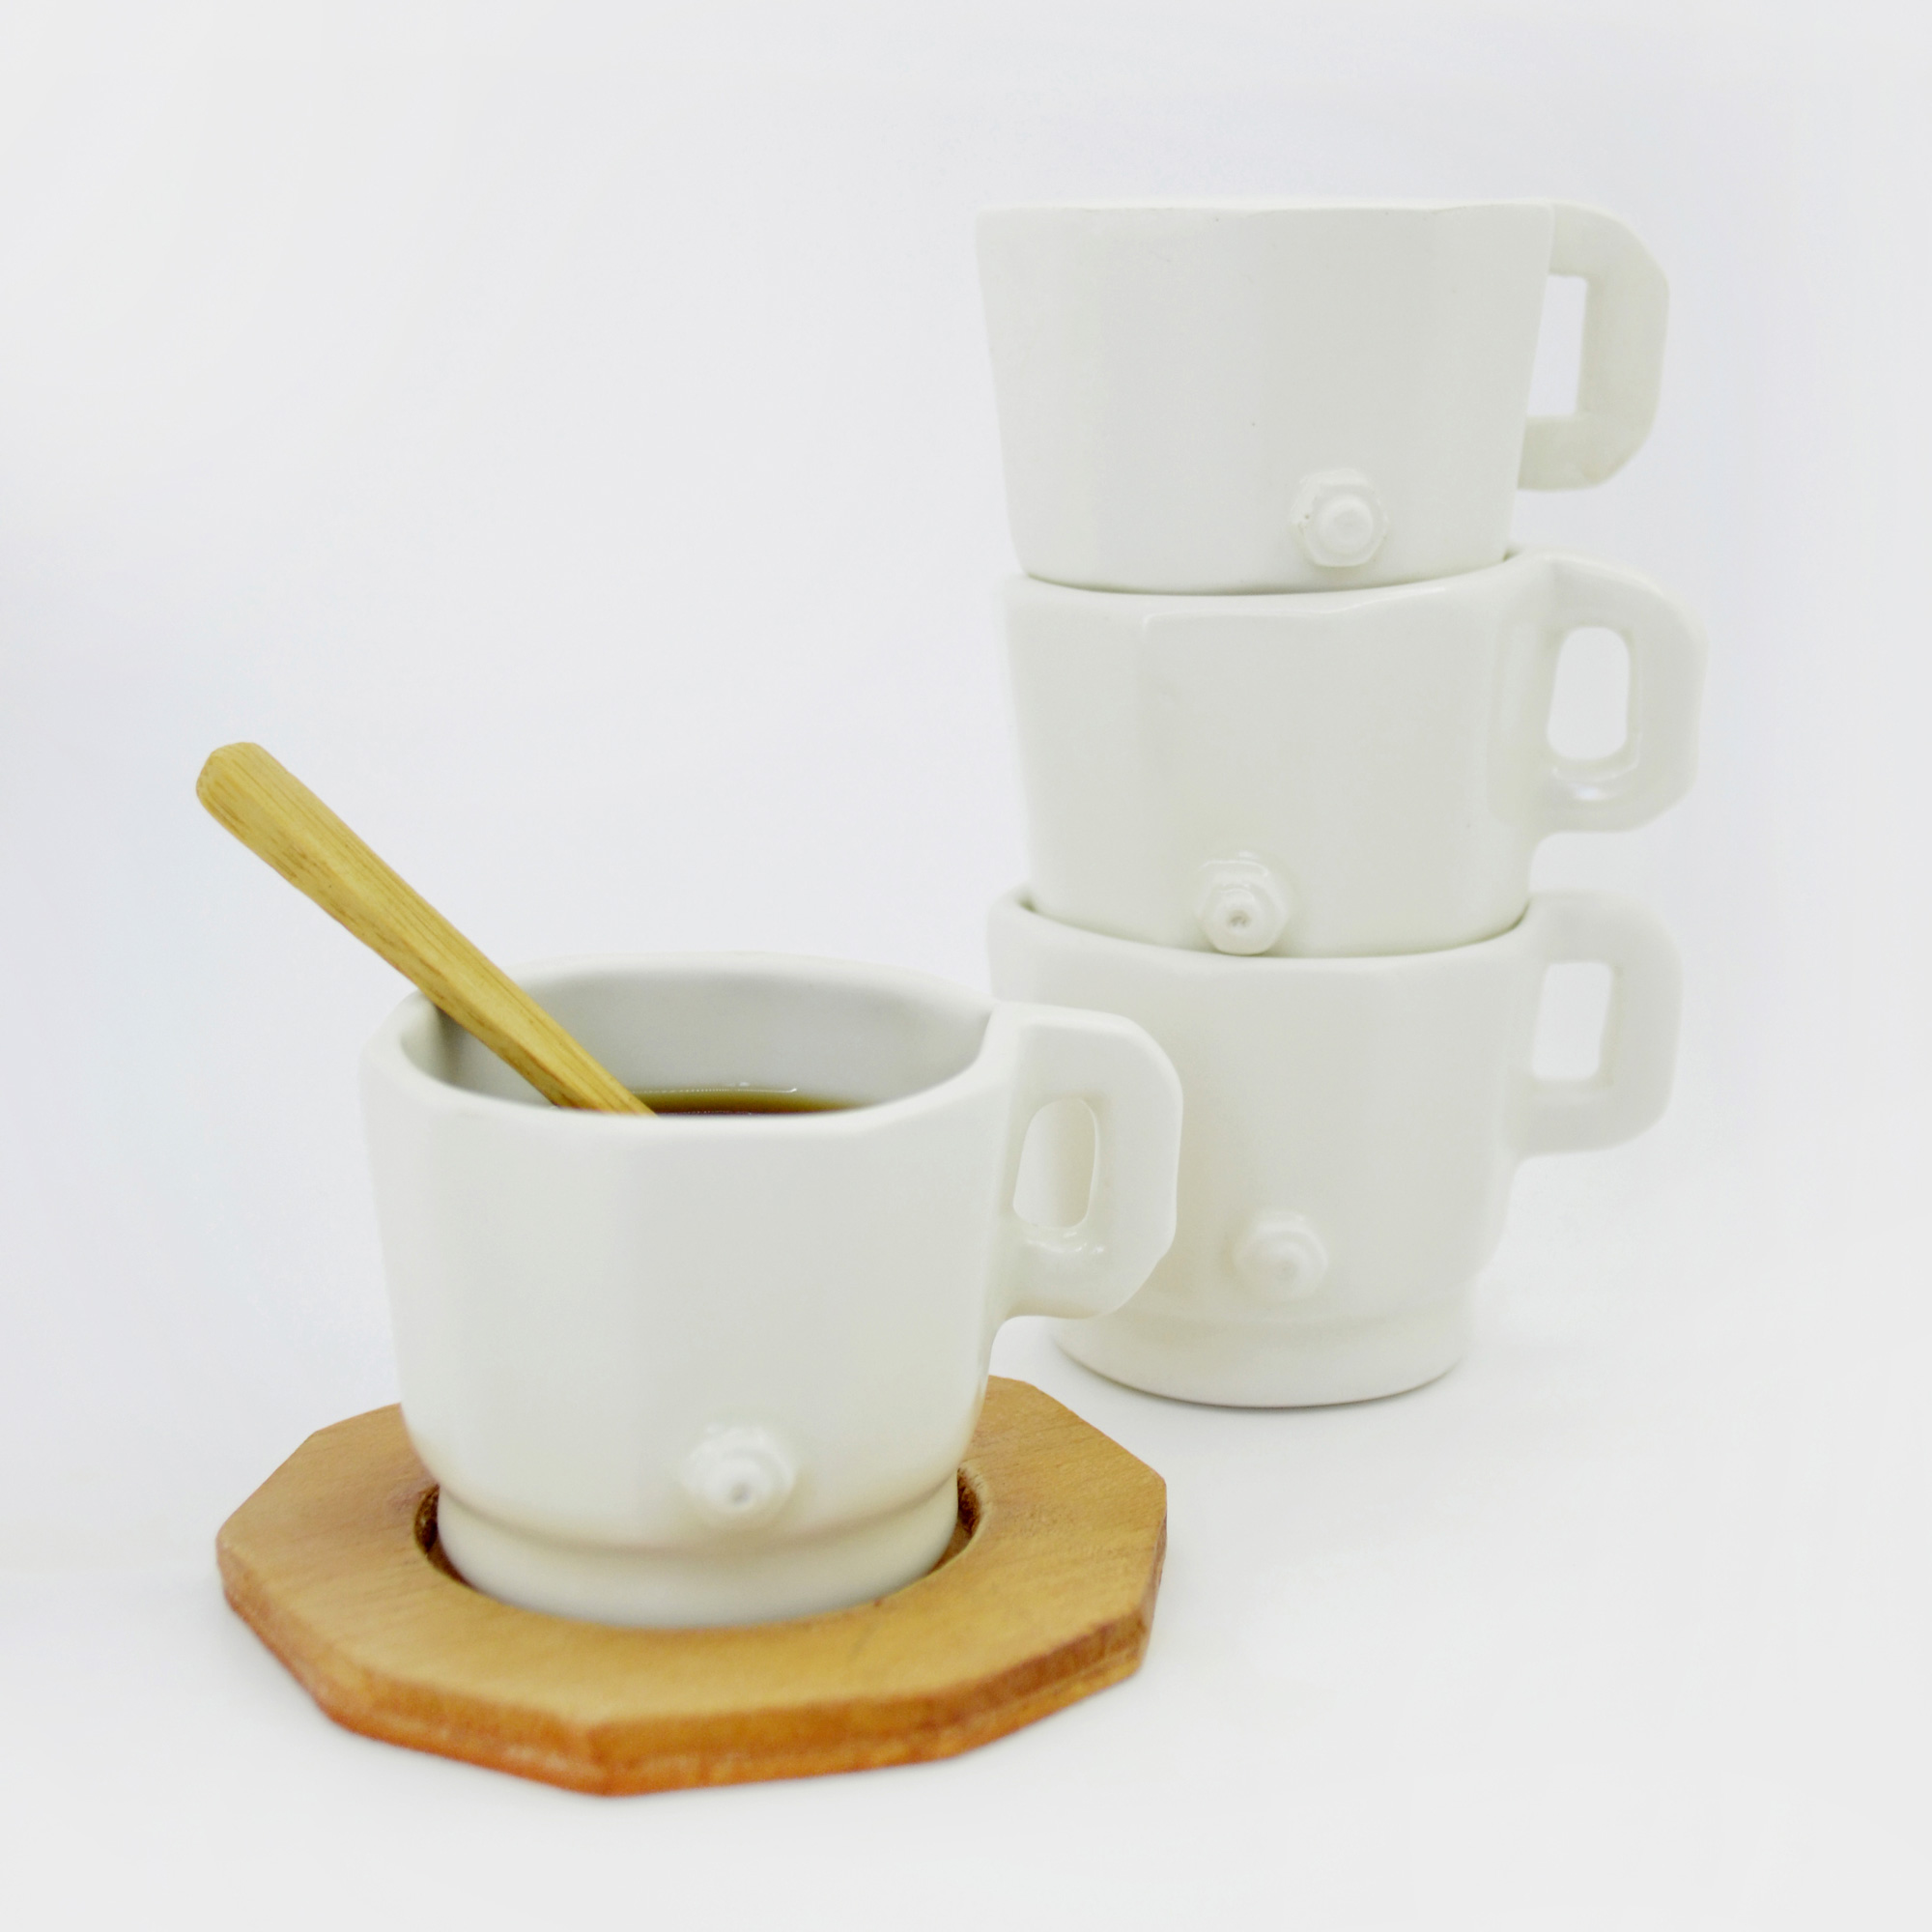 taza ceramica pequeña hecha a mano cafe espreso de diseño hecha a mano